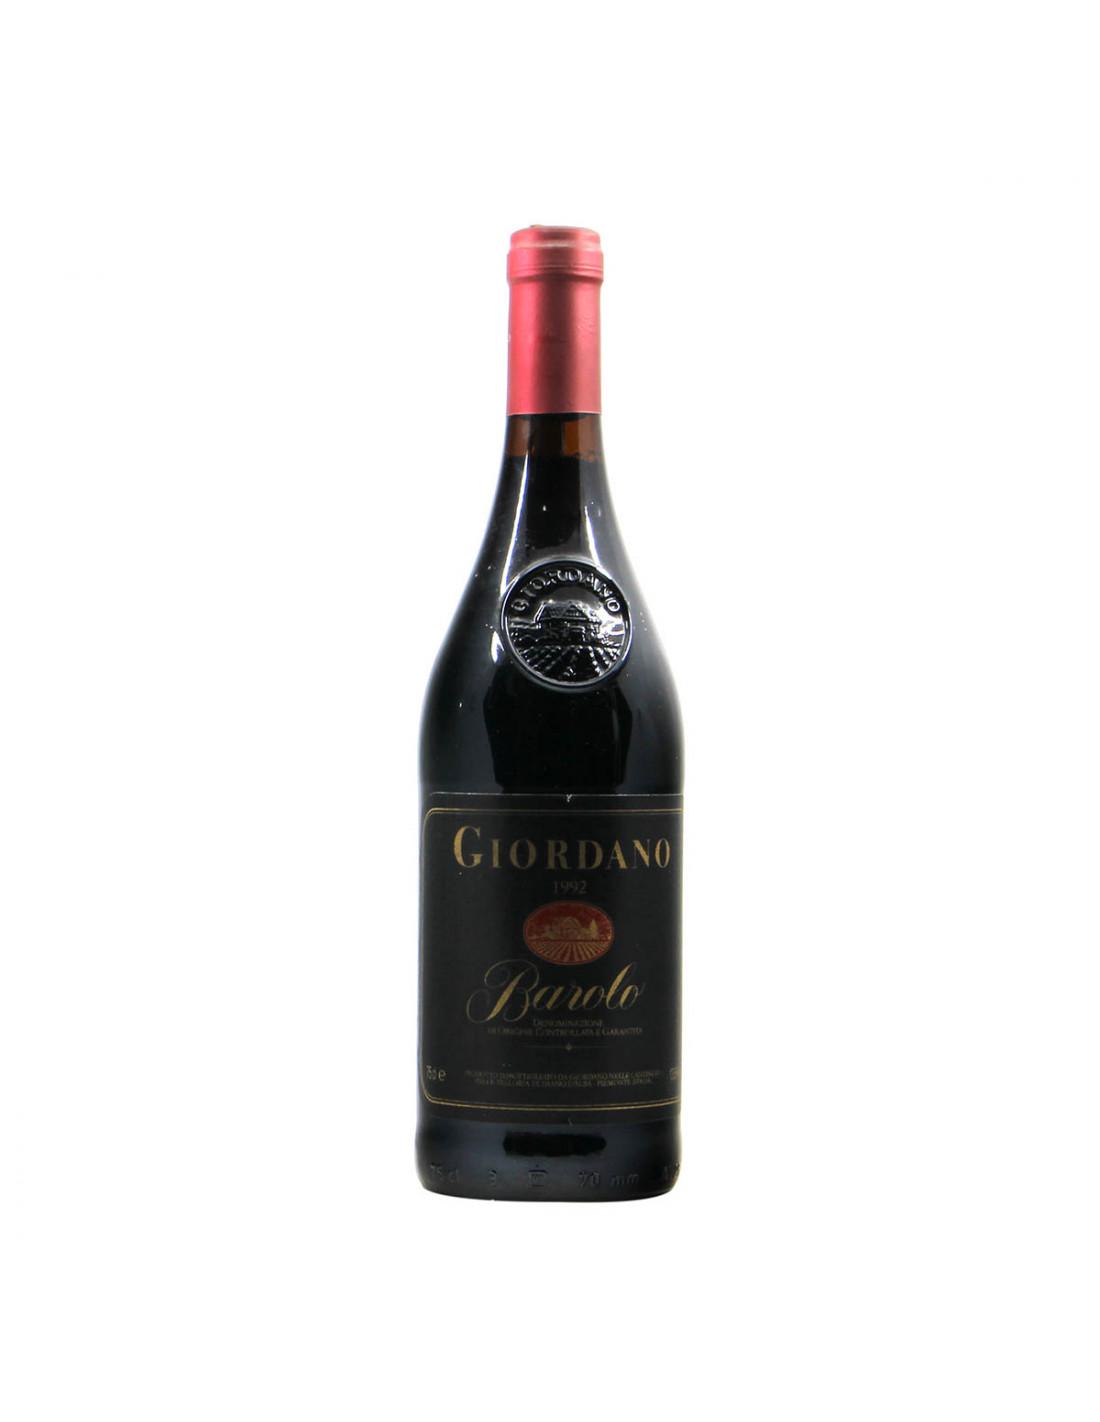 Giordano Barolo 1992 Grandi bottiglie